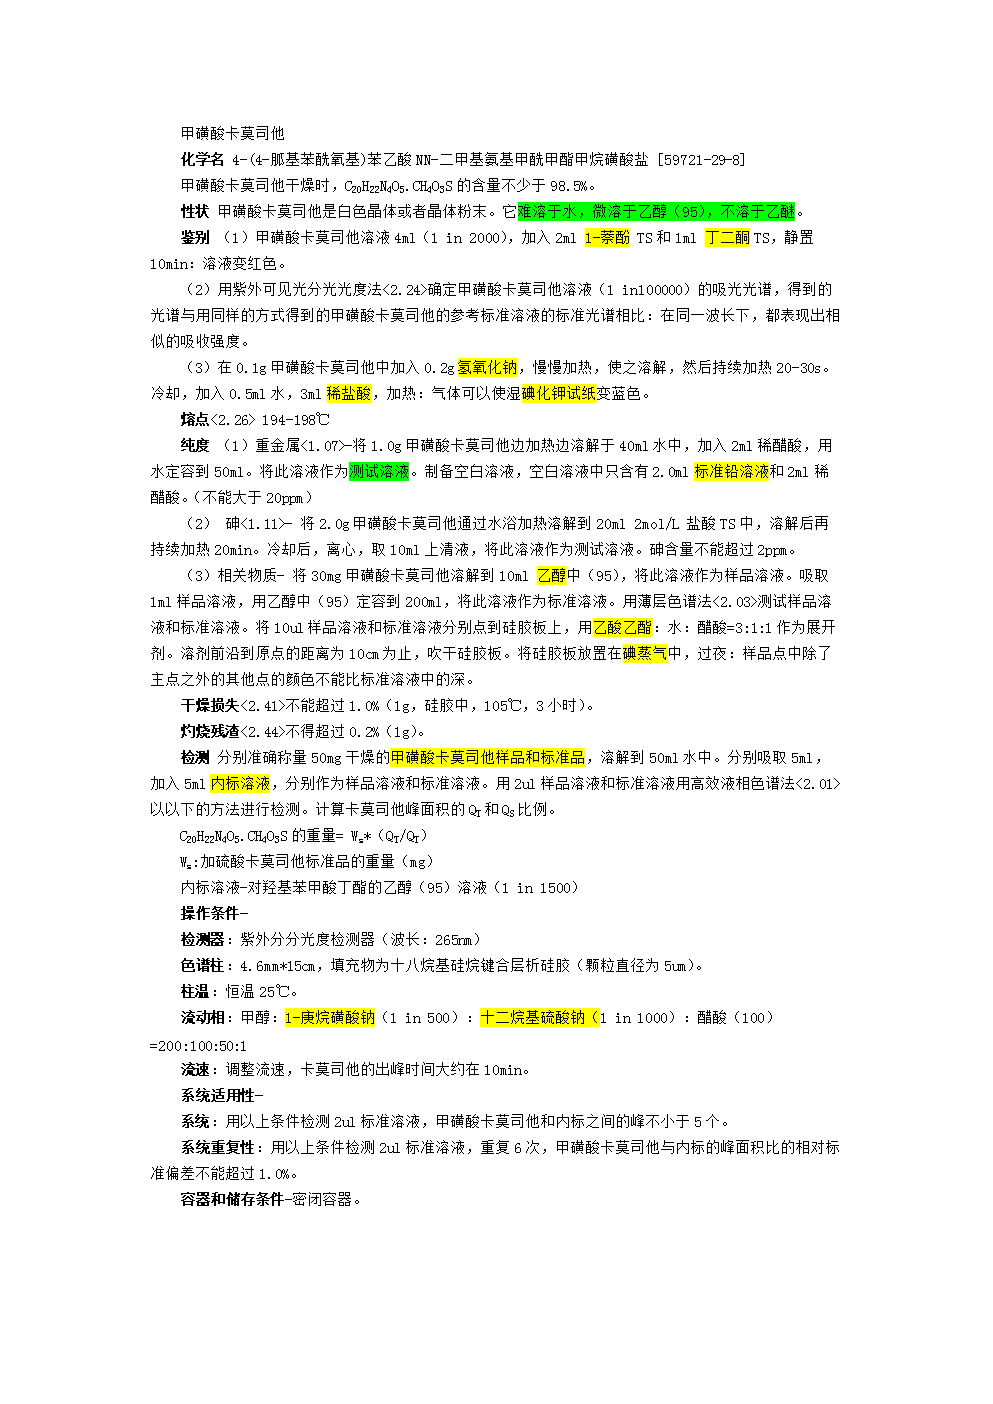 Camostat-Mesilate-T,甲磺酸卡莫斯他HPLC中文翻译.doc